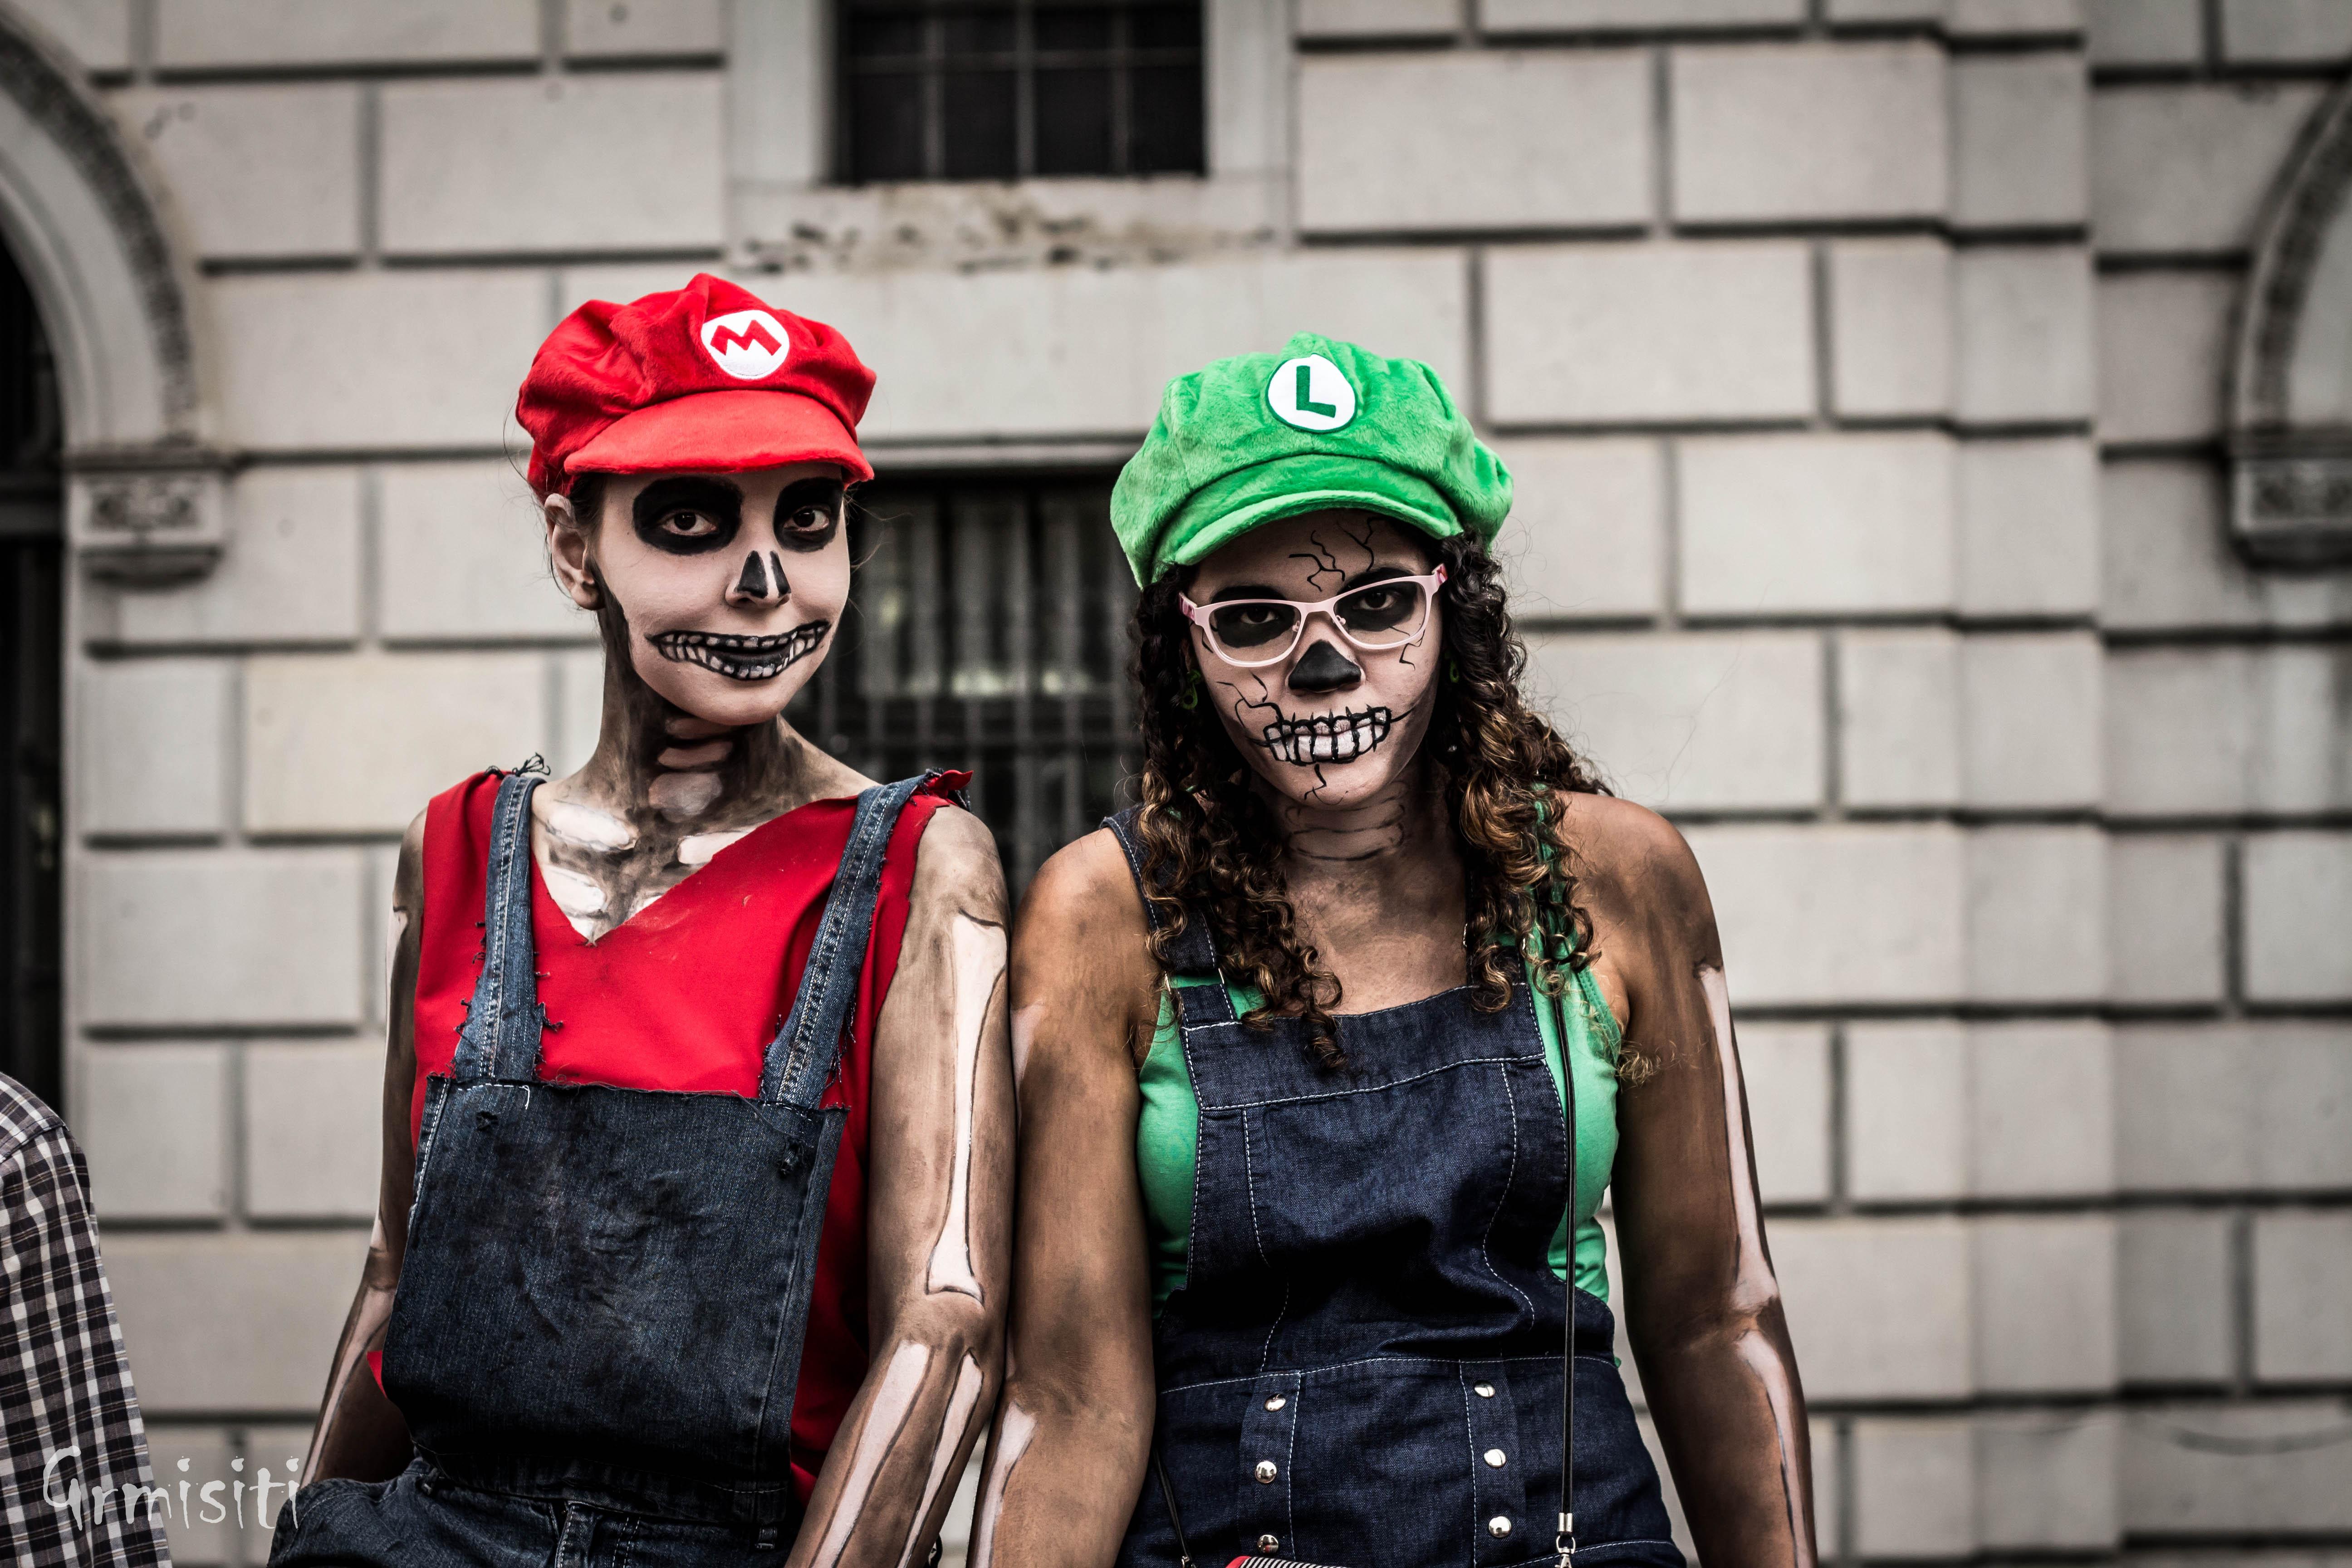 〔Halloween 系列〕就是要打殭屍?殭屍也要手癢 APP 一下